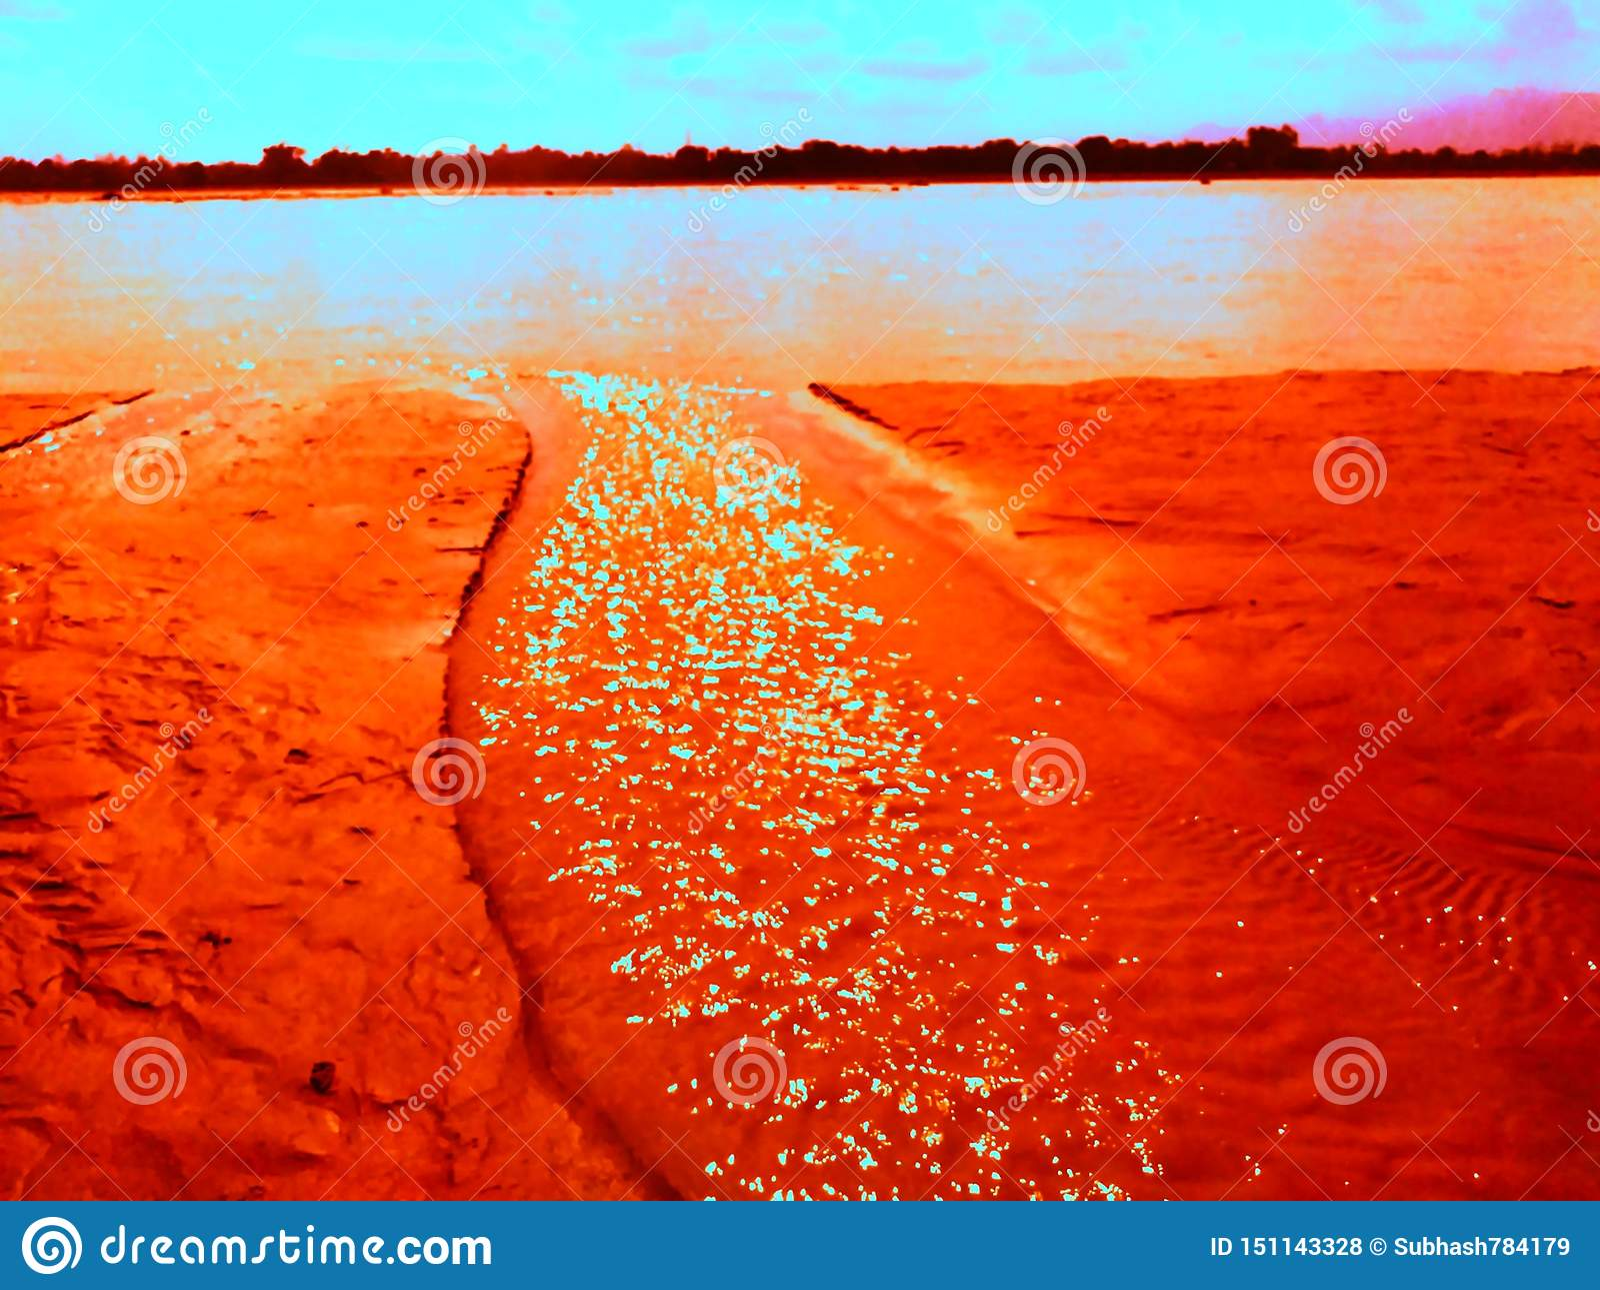 Beautiful Sunset Lack Wallpaper Picture Stock Illustration